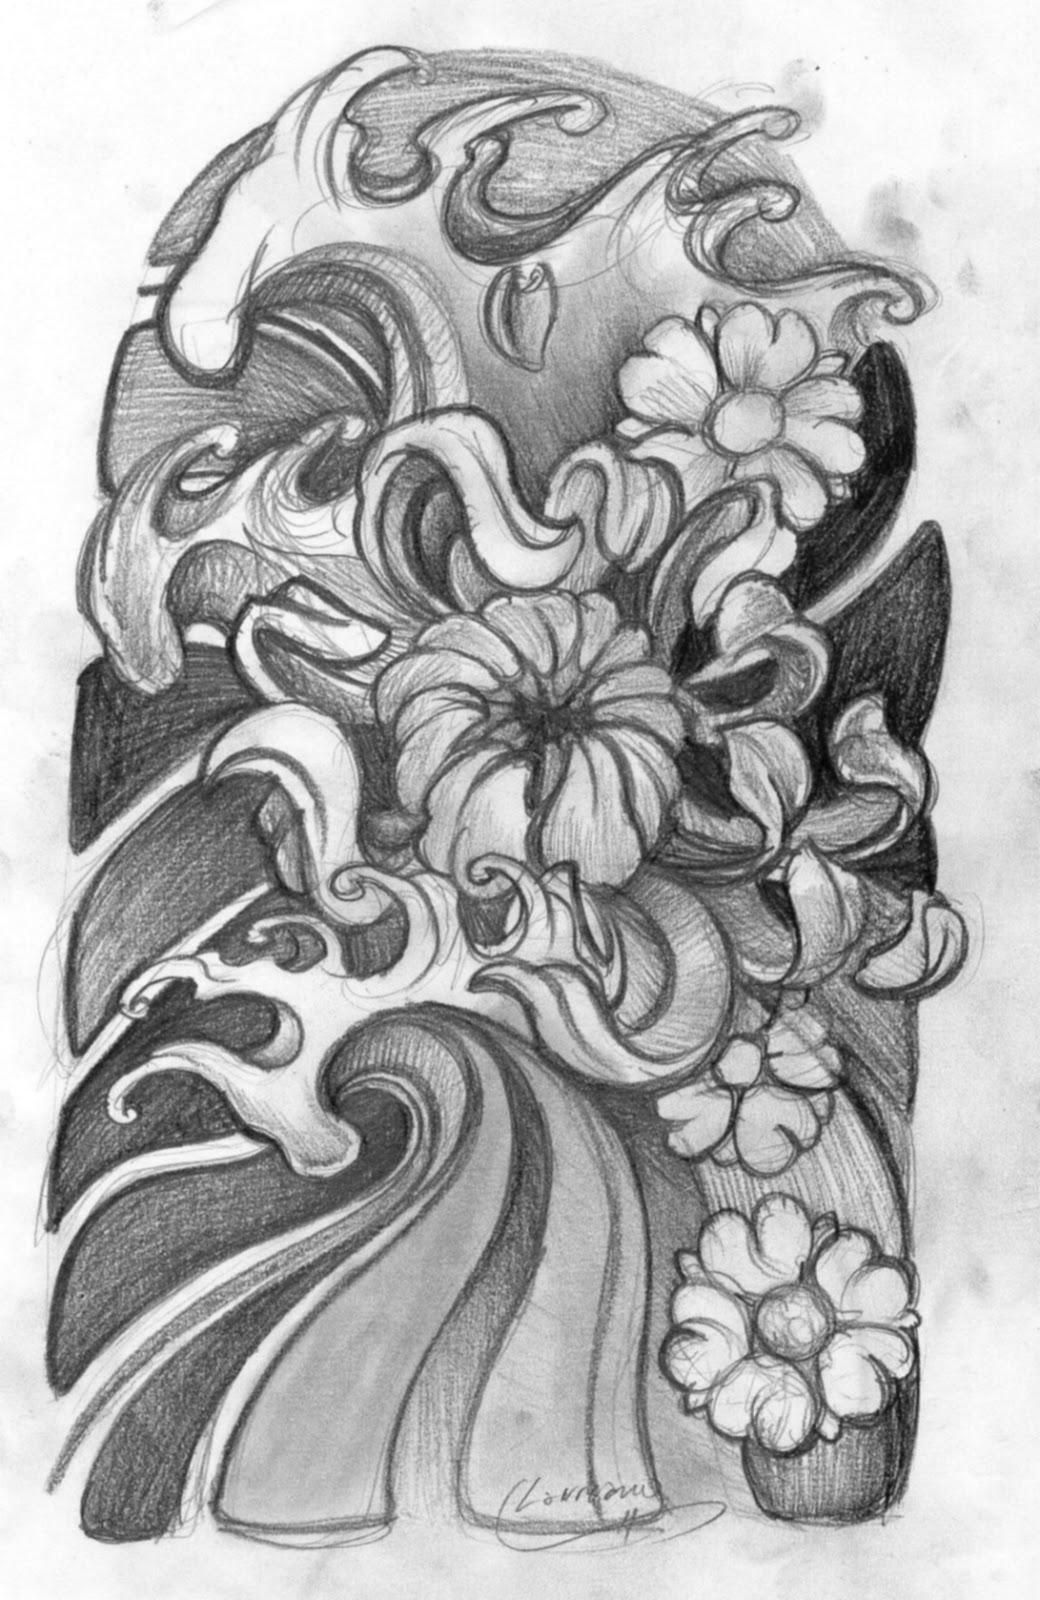 Disenos Populares De Tatuajes: Lorien Tattoo: Diseños Nuevos Para Tatuajes